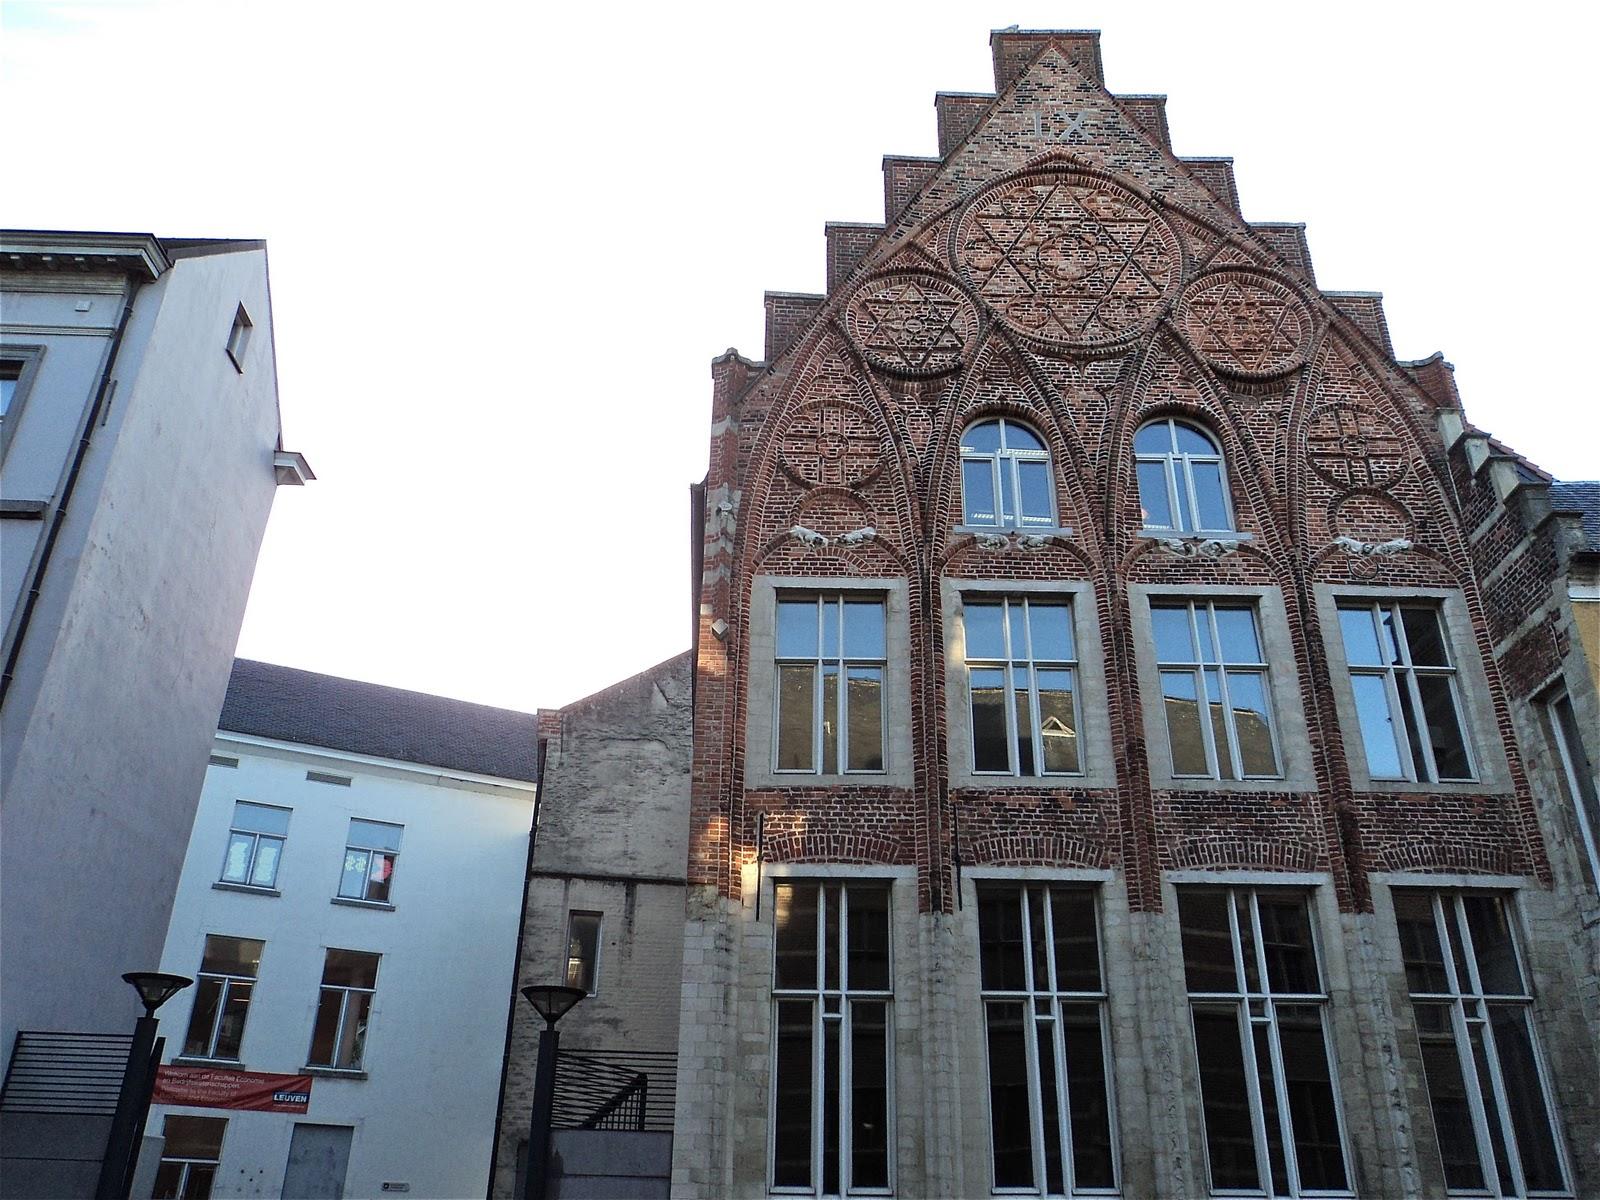 http://3.bp.blogspot.com/-6qcho5kDW3k/ToMsWHQRA_I/AAAAAAAAAMk/LsjlIcKgXI8/s1600/College_van_de_Hoge_Heuvel_Leuven.jpg